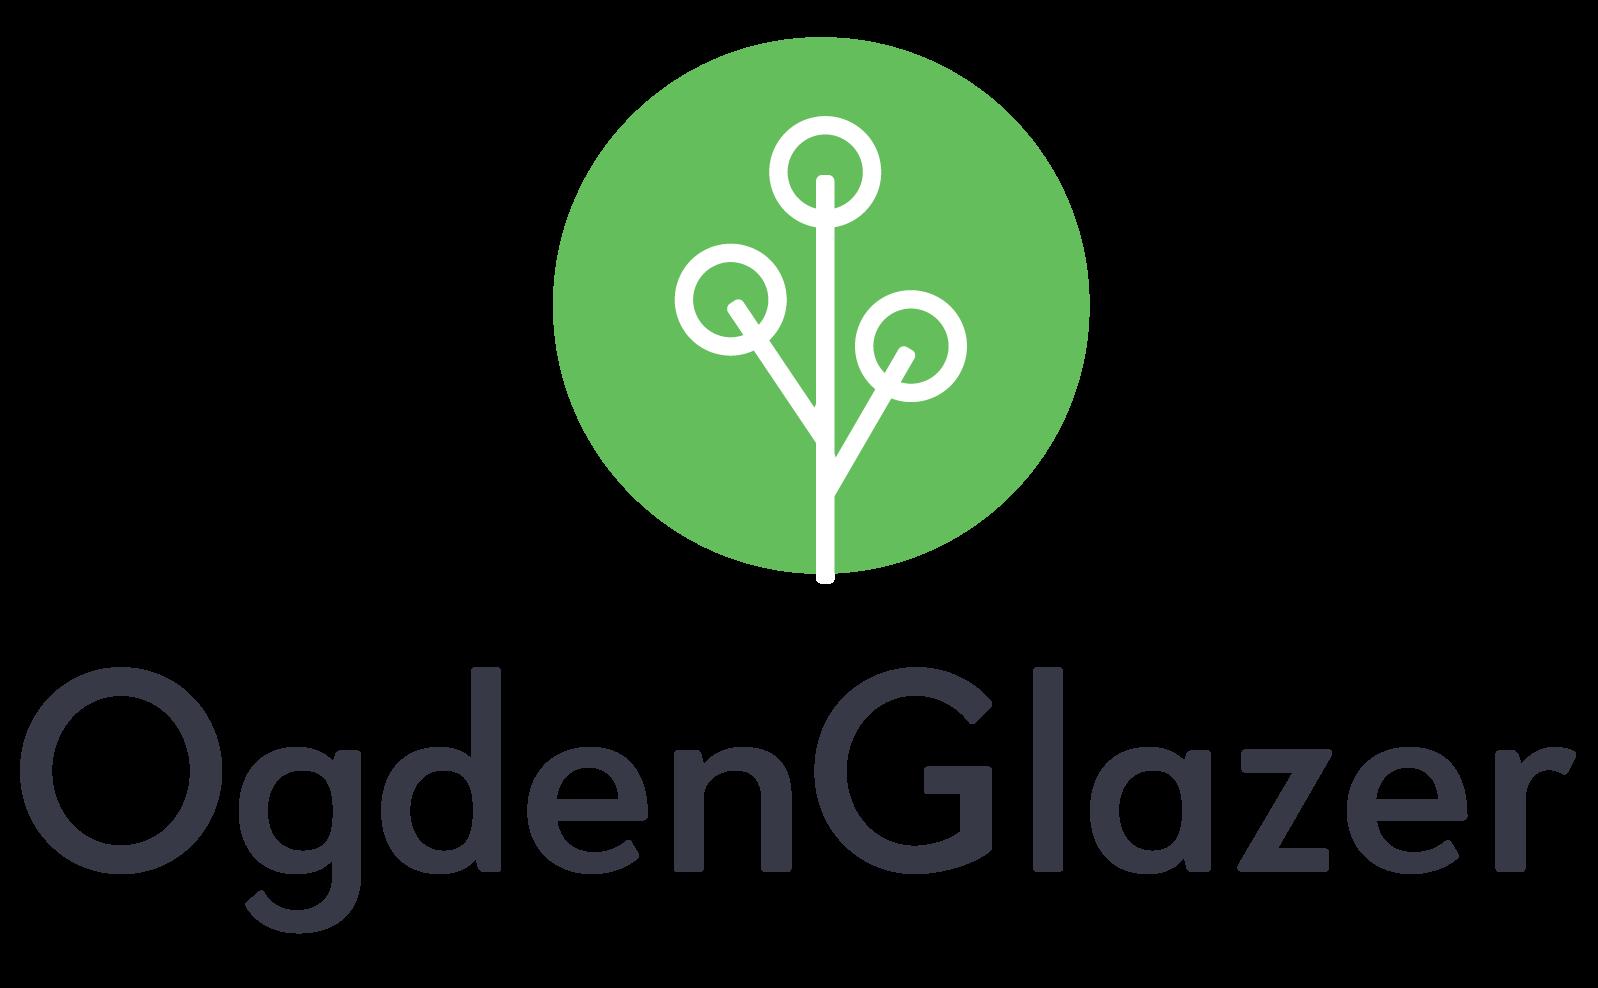 ogdenglazer_logo_feb2017_mark_filled